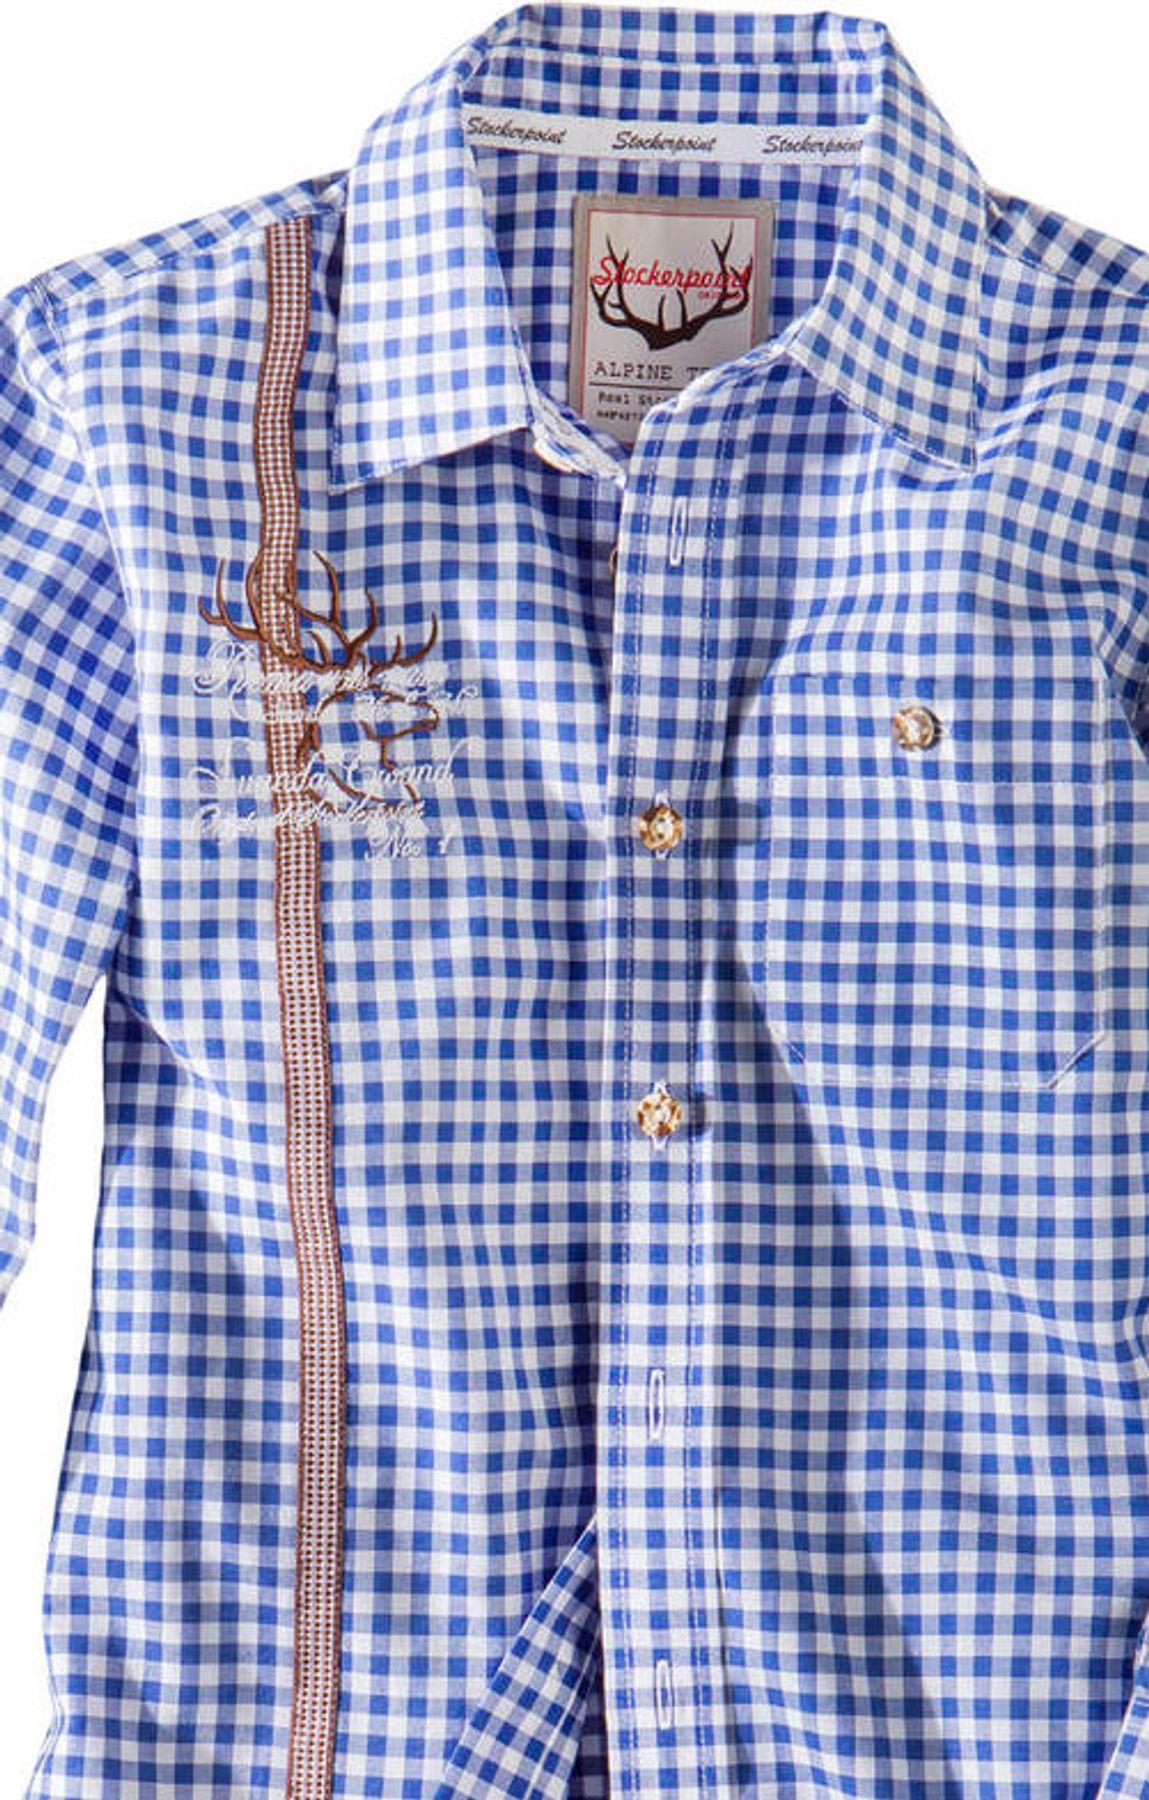 Stockerpoint - Kinder Trachten Hemd Leo, Gr. 122-152 – Bild 8